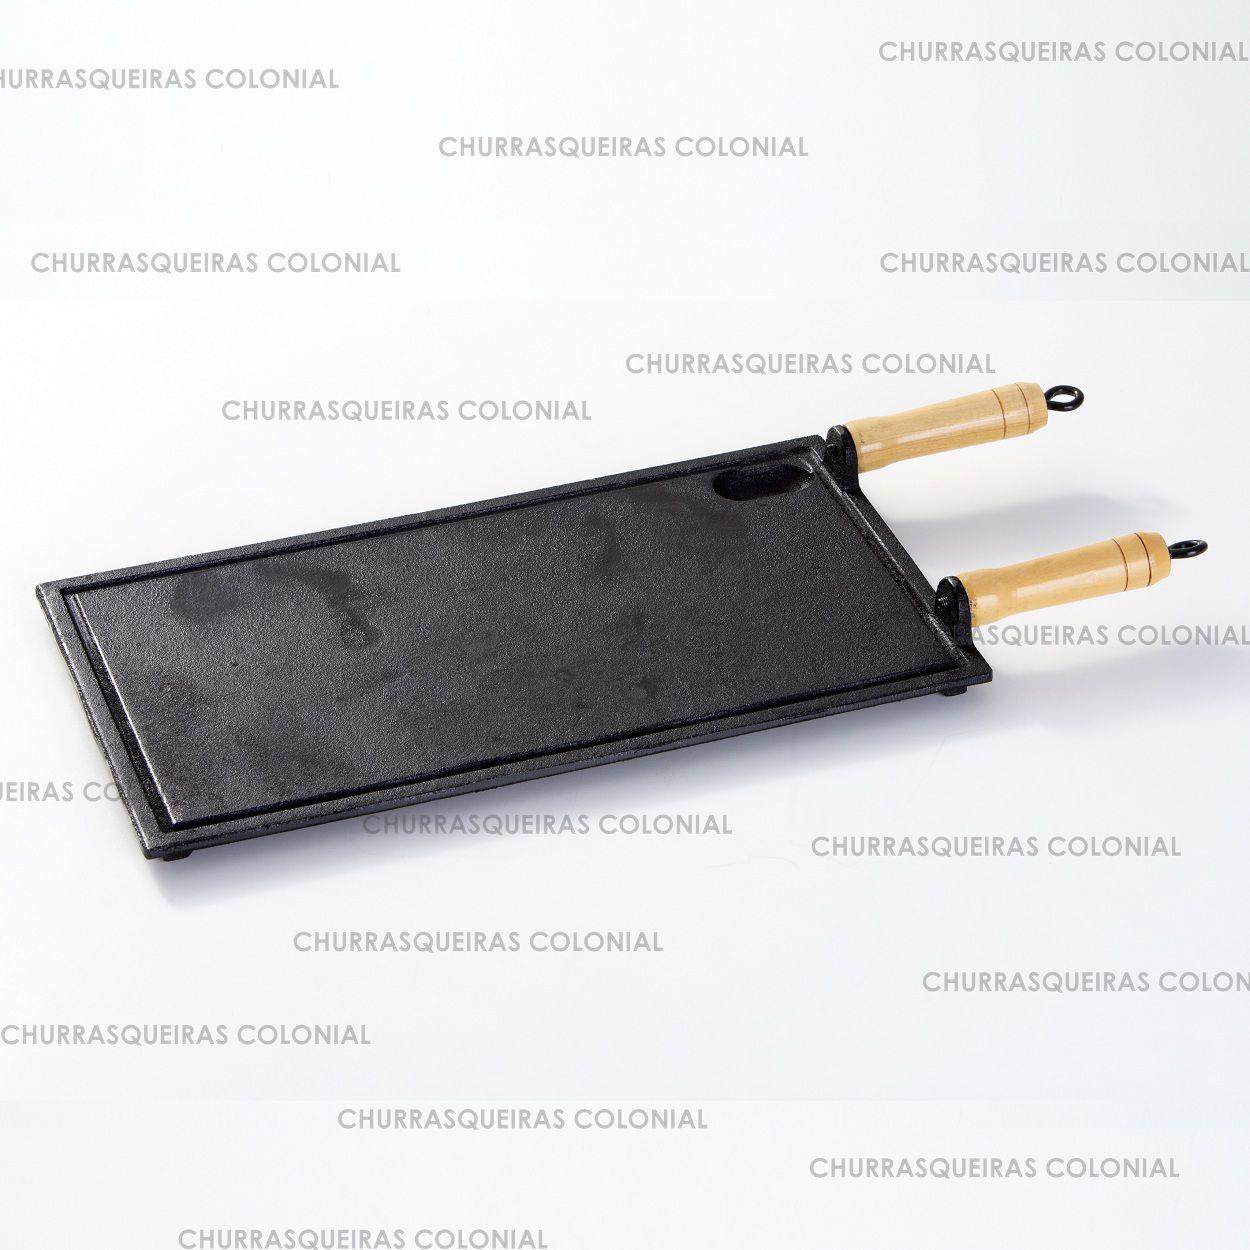 Chapa Bifeteira Lisa de Ferro Fundido 25 x 45 cm + Amassador Bifes